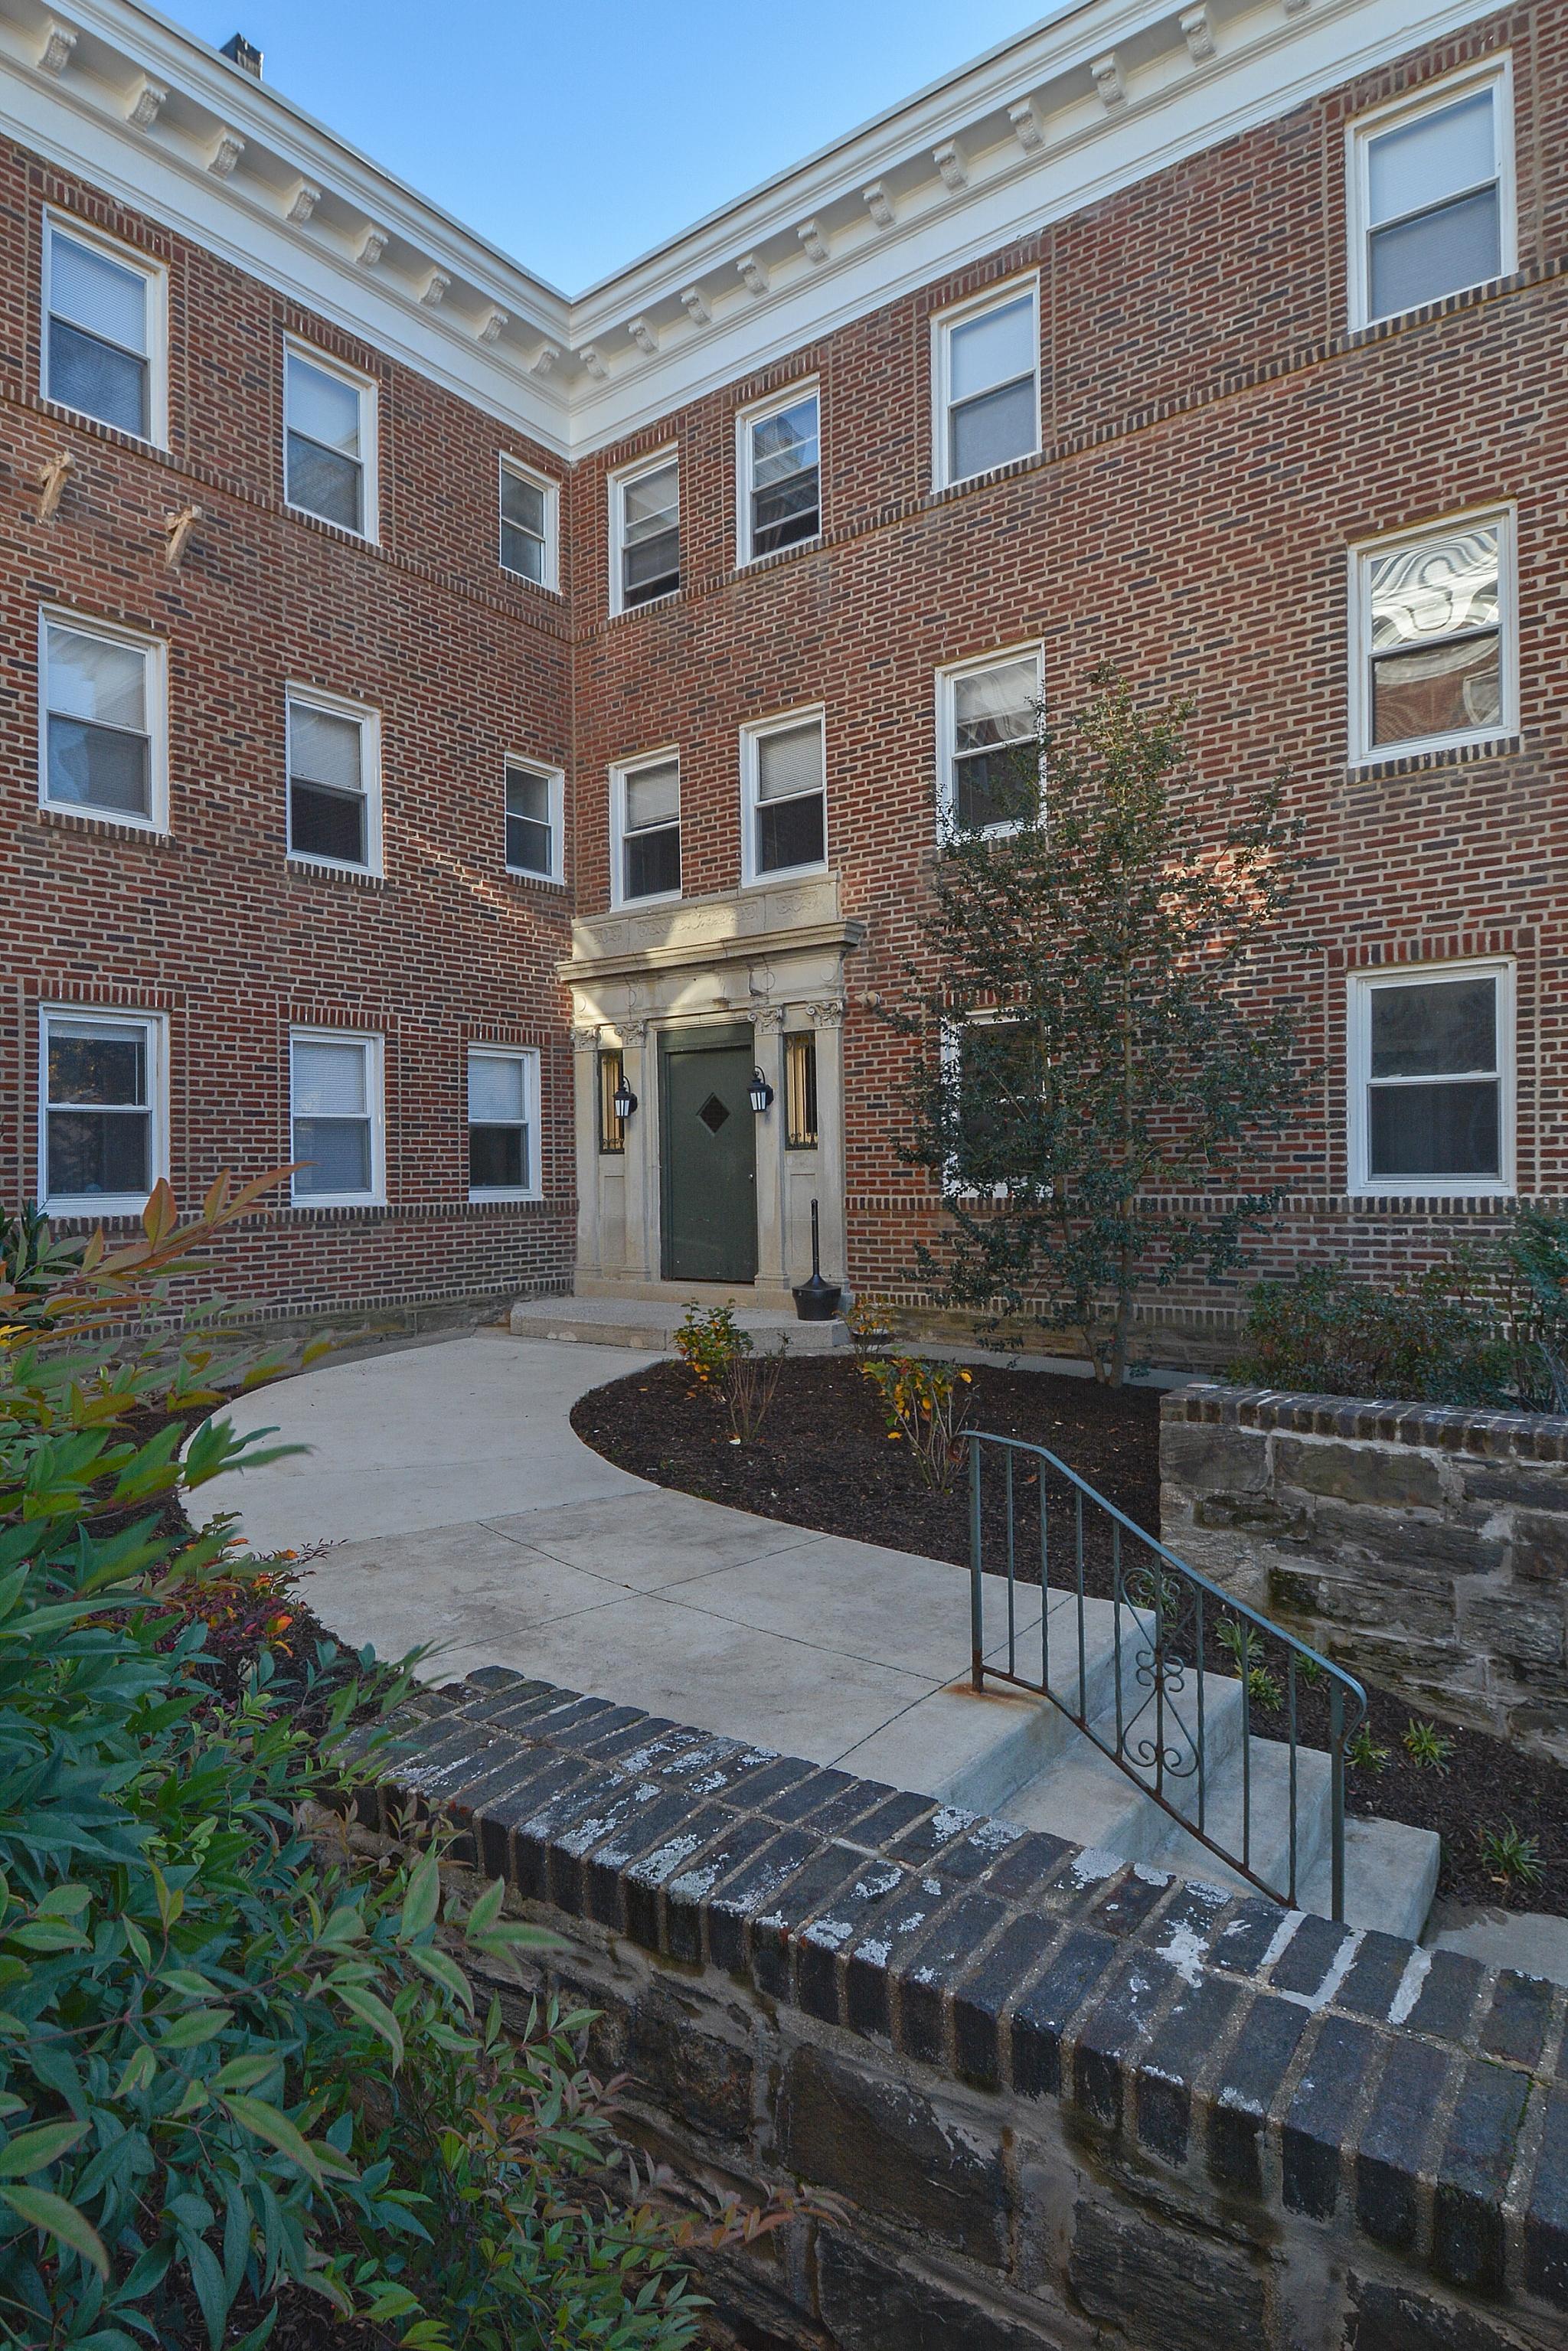 Suburban Court Apartments image 3